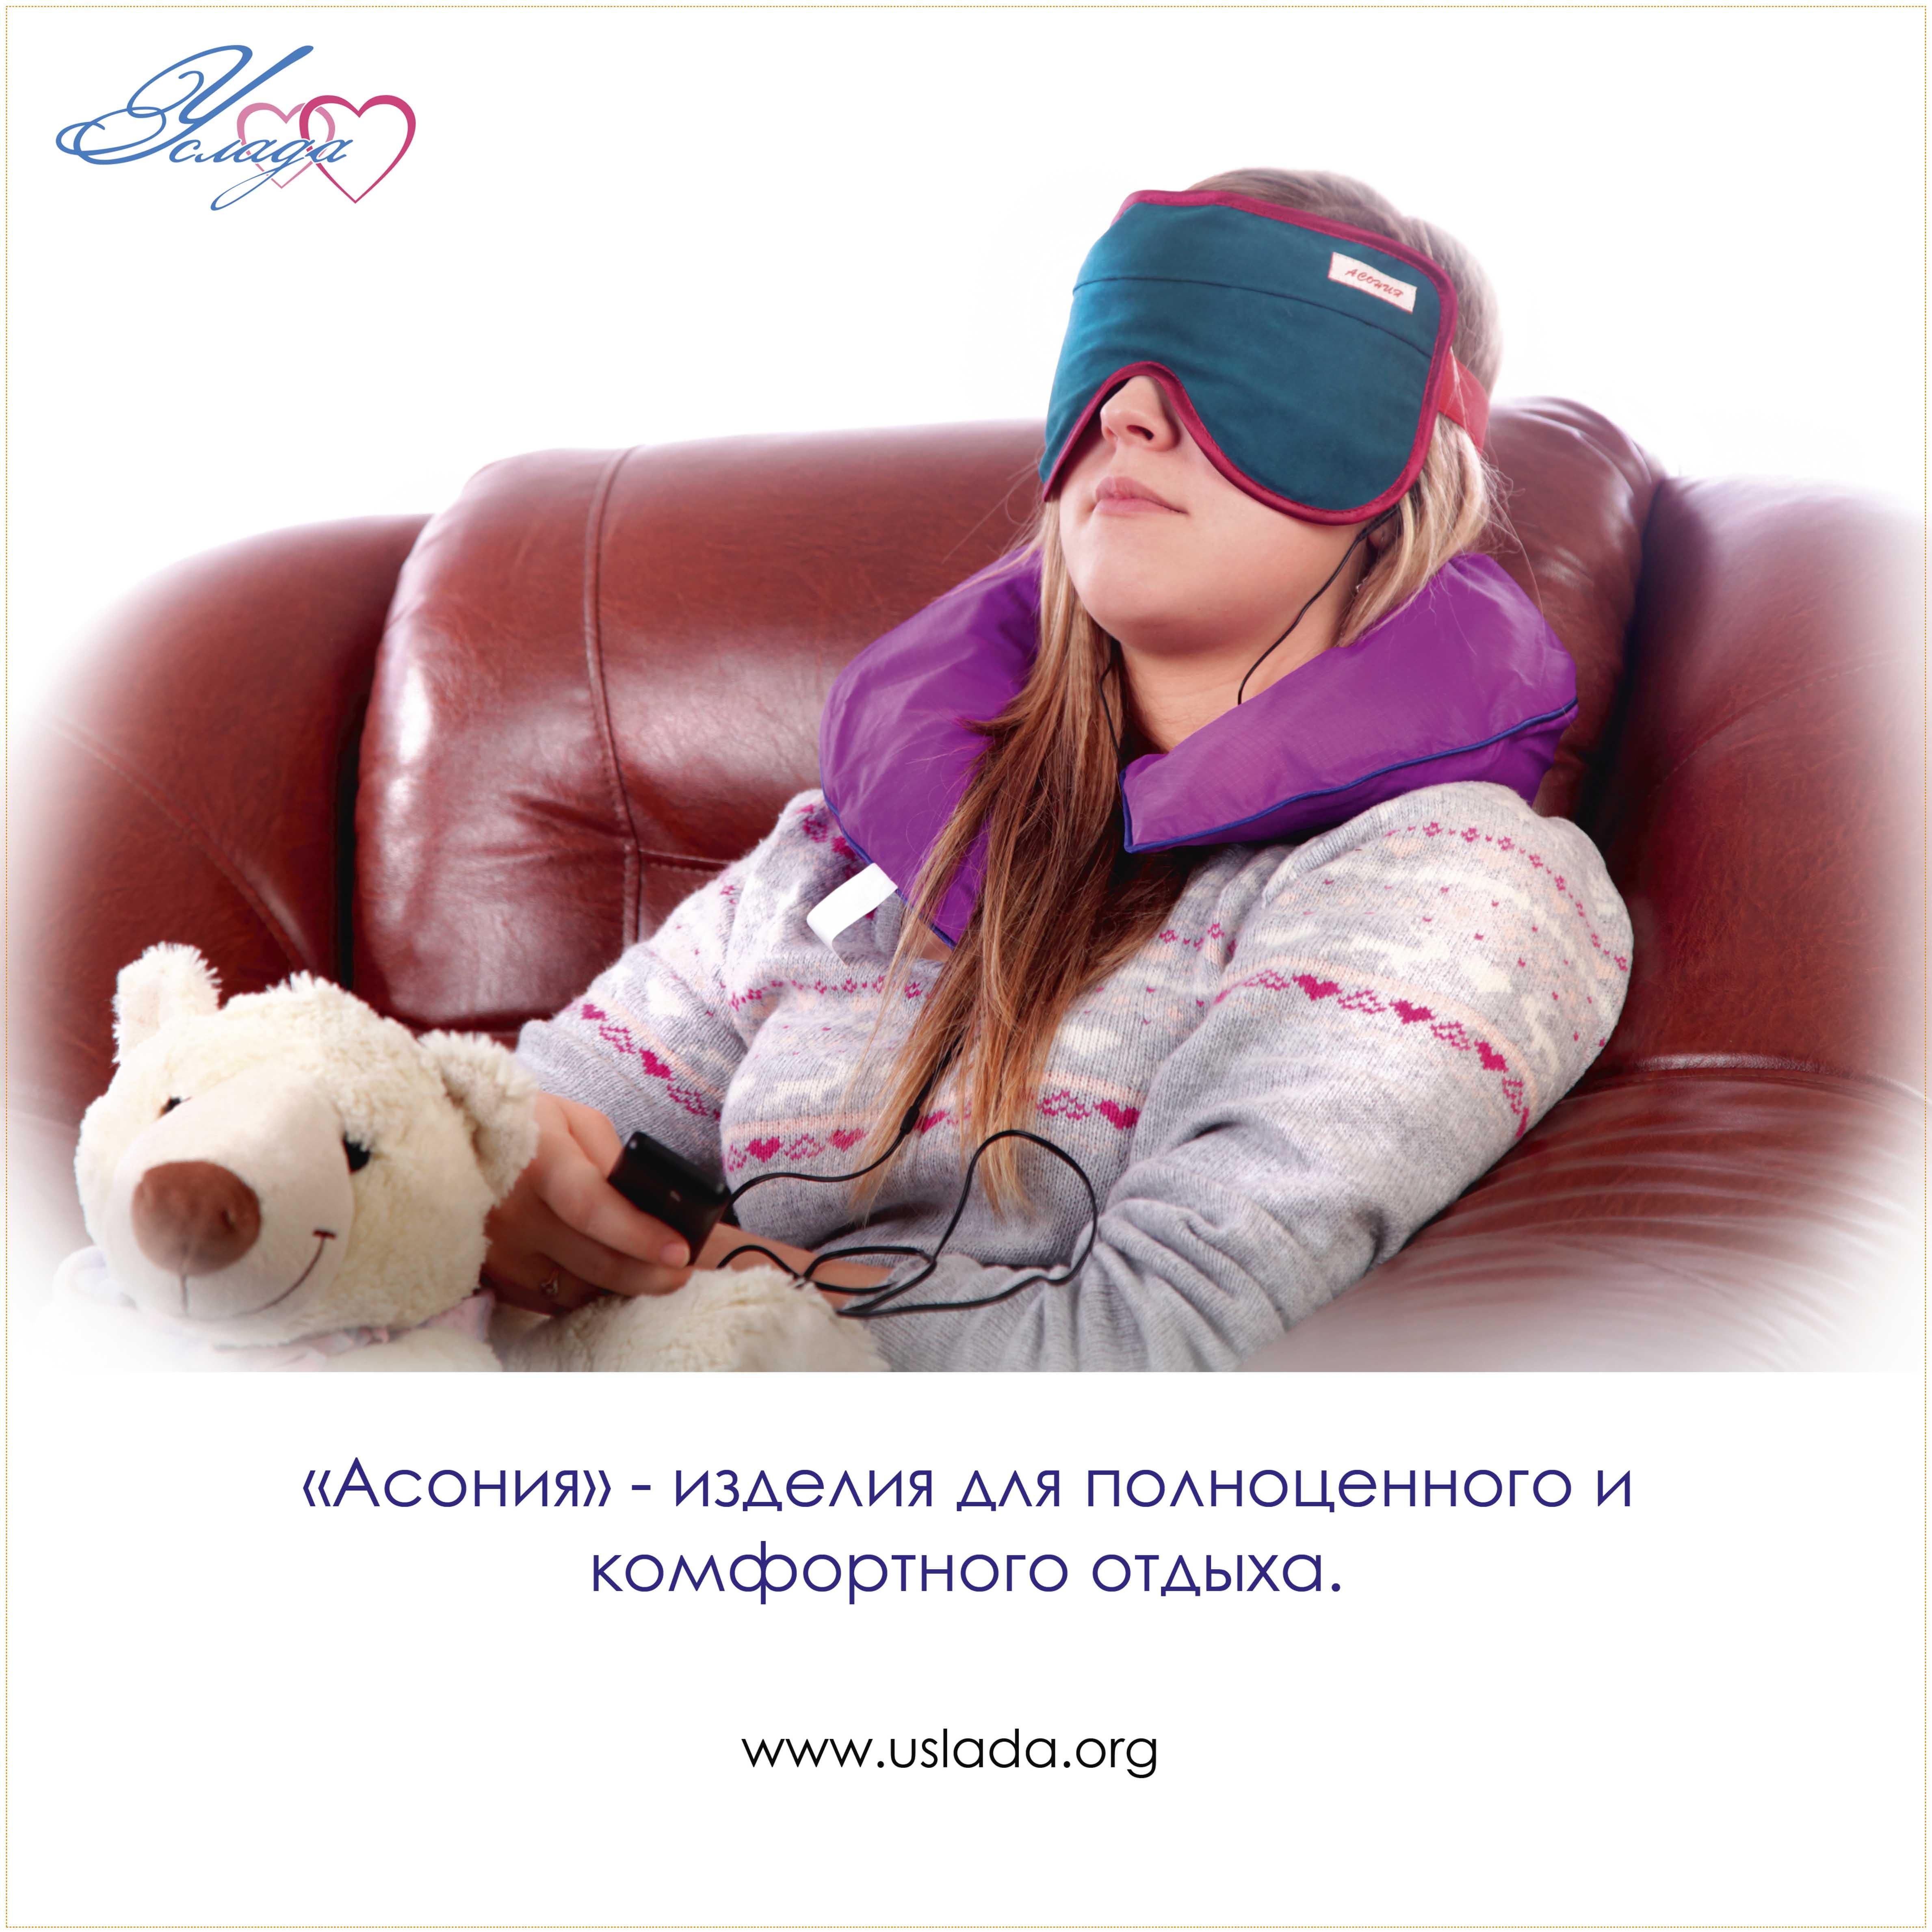 p56352_o-17_plakat_600x600_40_page_3